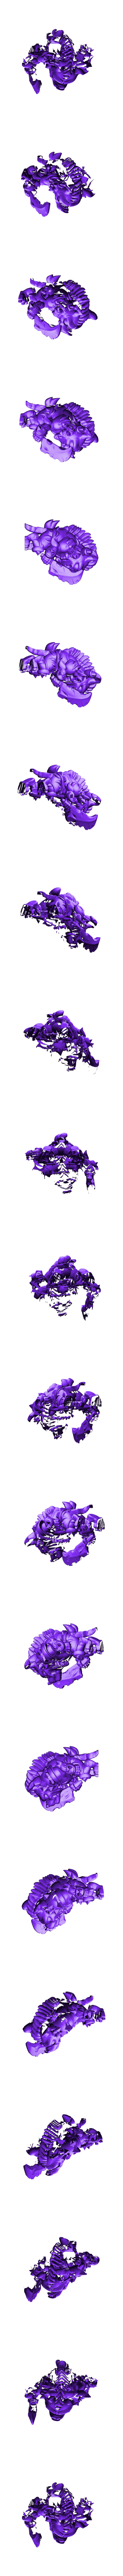 gnoll.stl Download free STL file Gnoll • 3D printable design, HeribertoValle